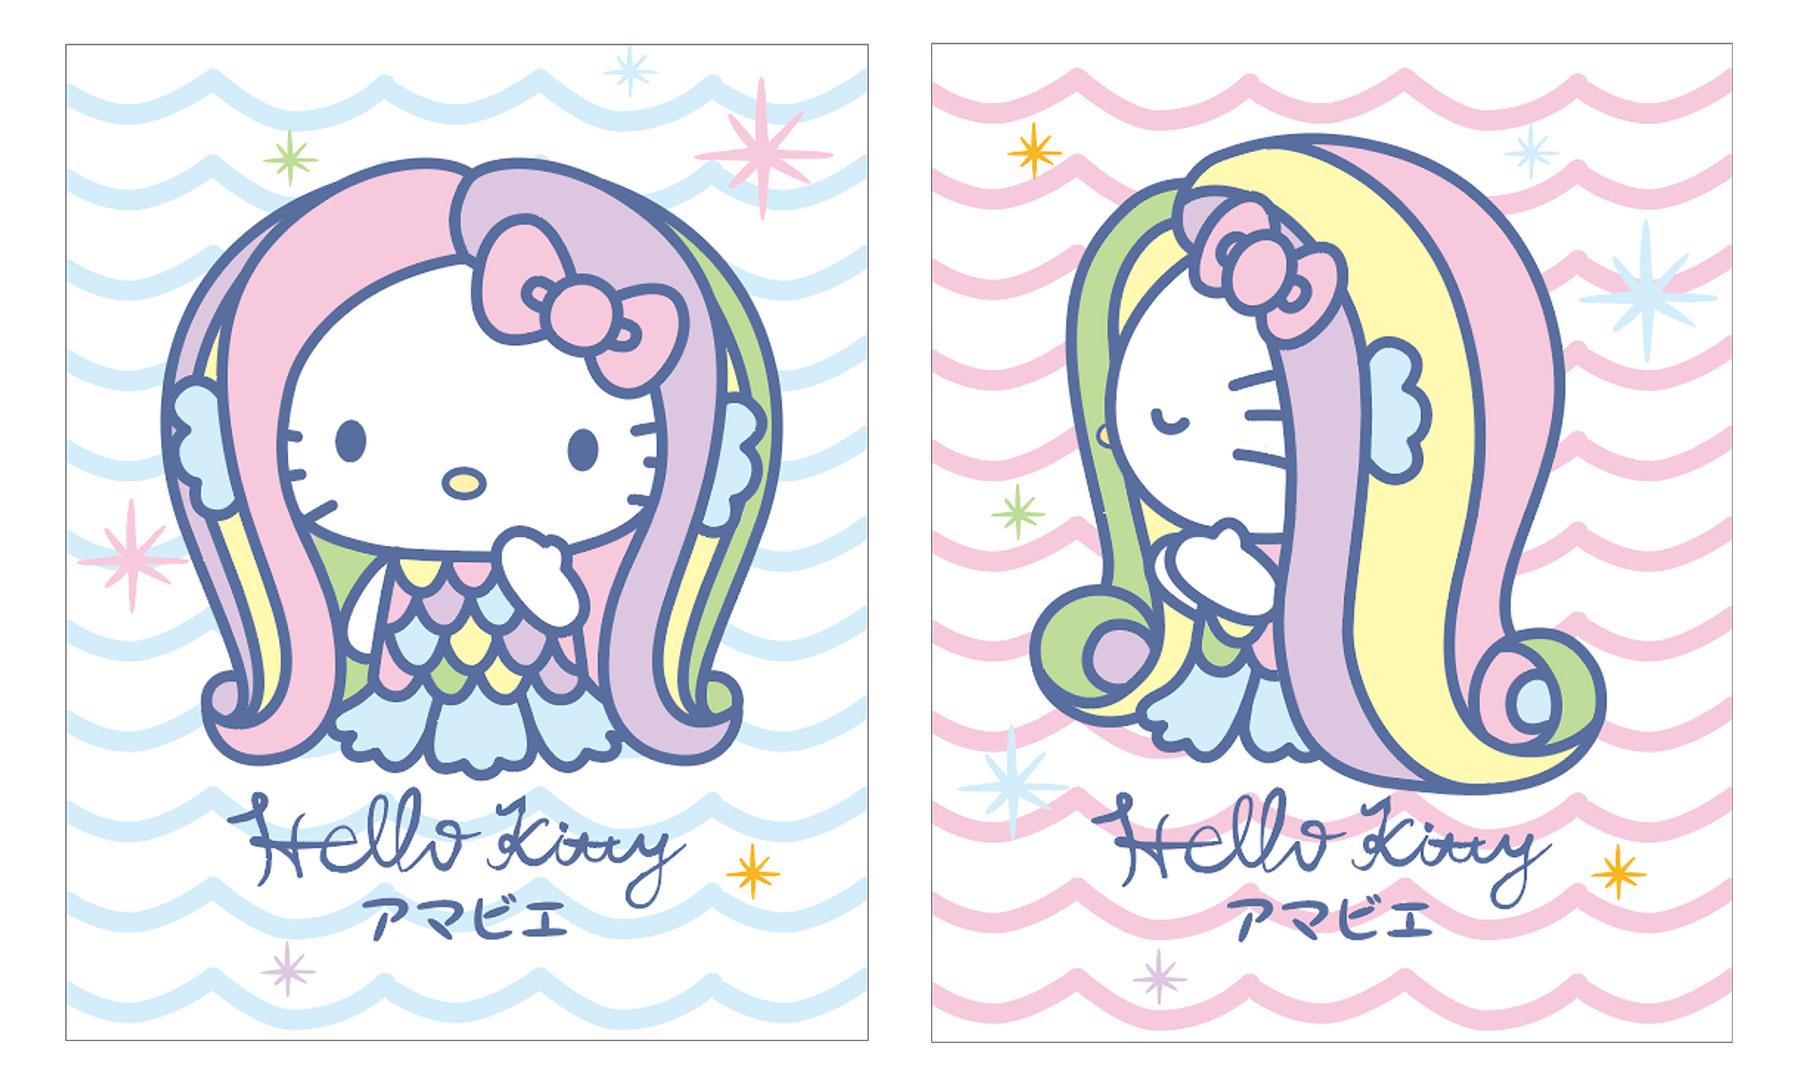 Hello Kitty_阿玛比埃联动商品_和邪社04